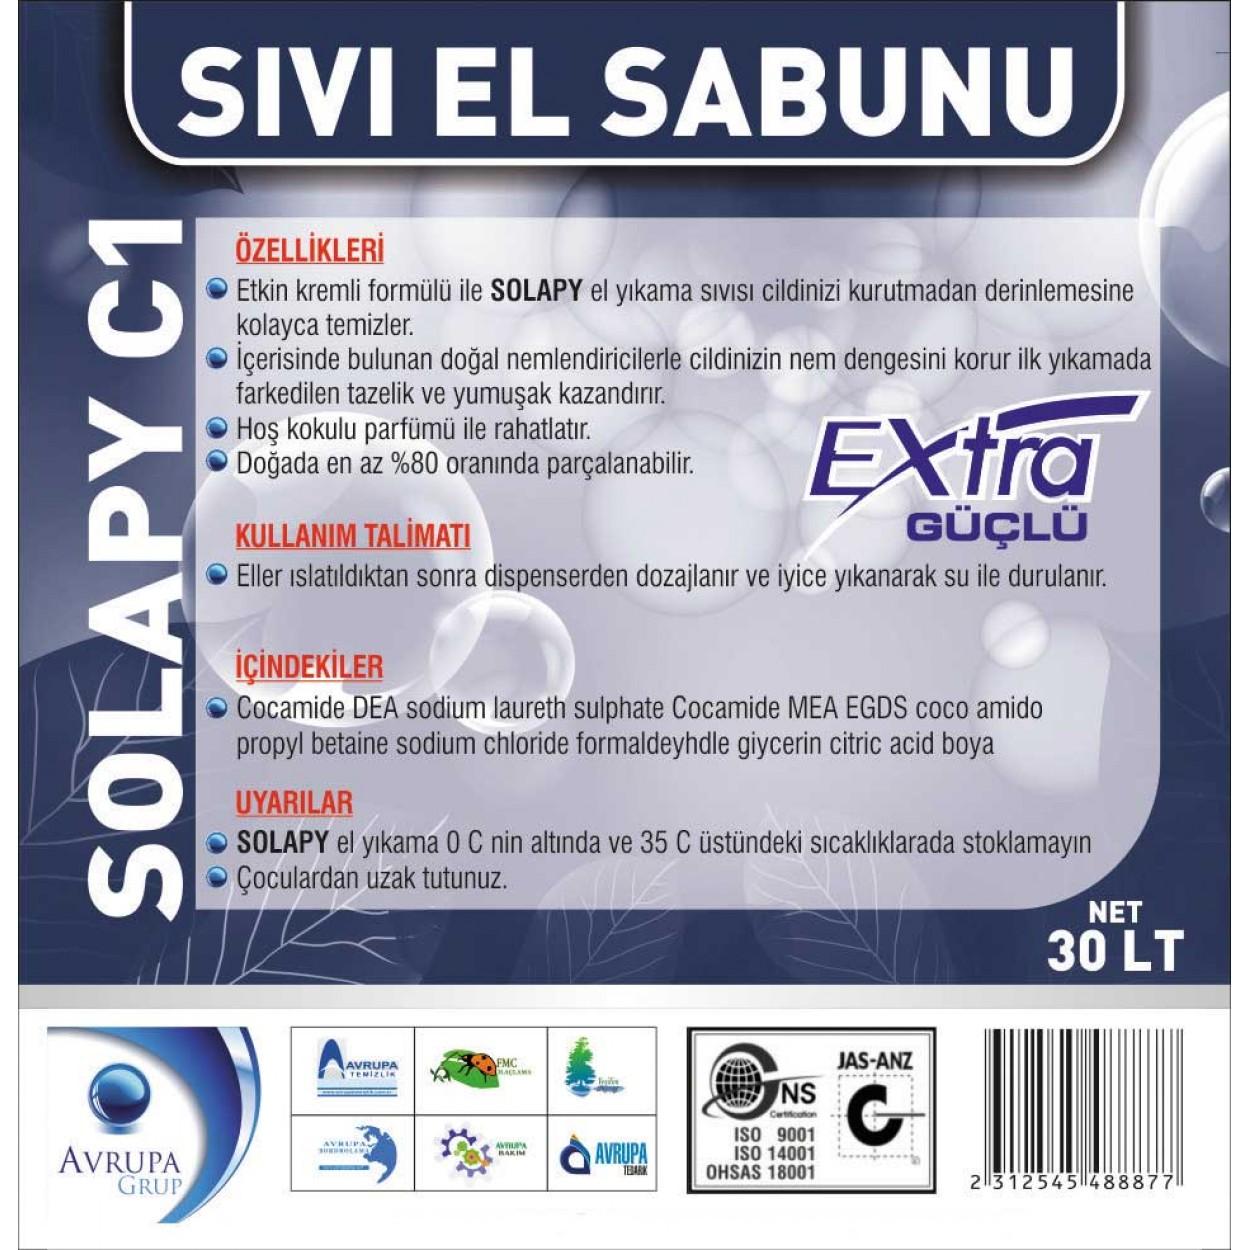 Solapy C1 Sedefli Parfümlü El Yıkama Sıvısı Ekstra 30 Litre